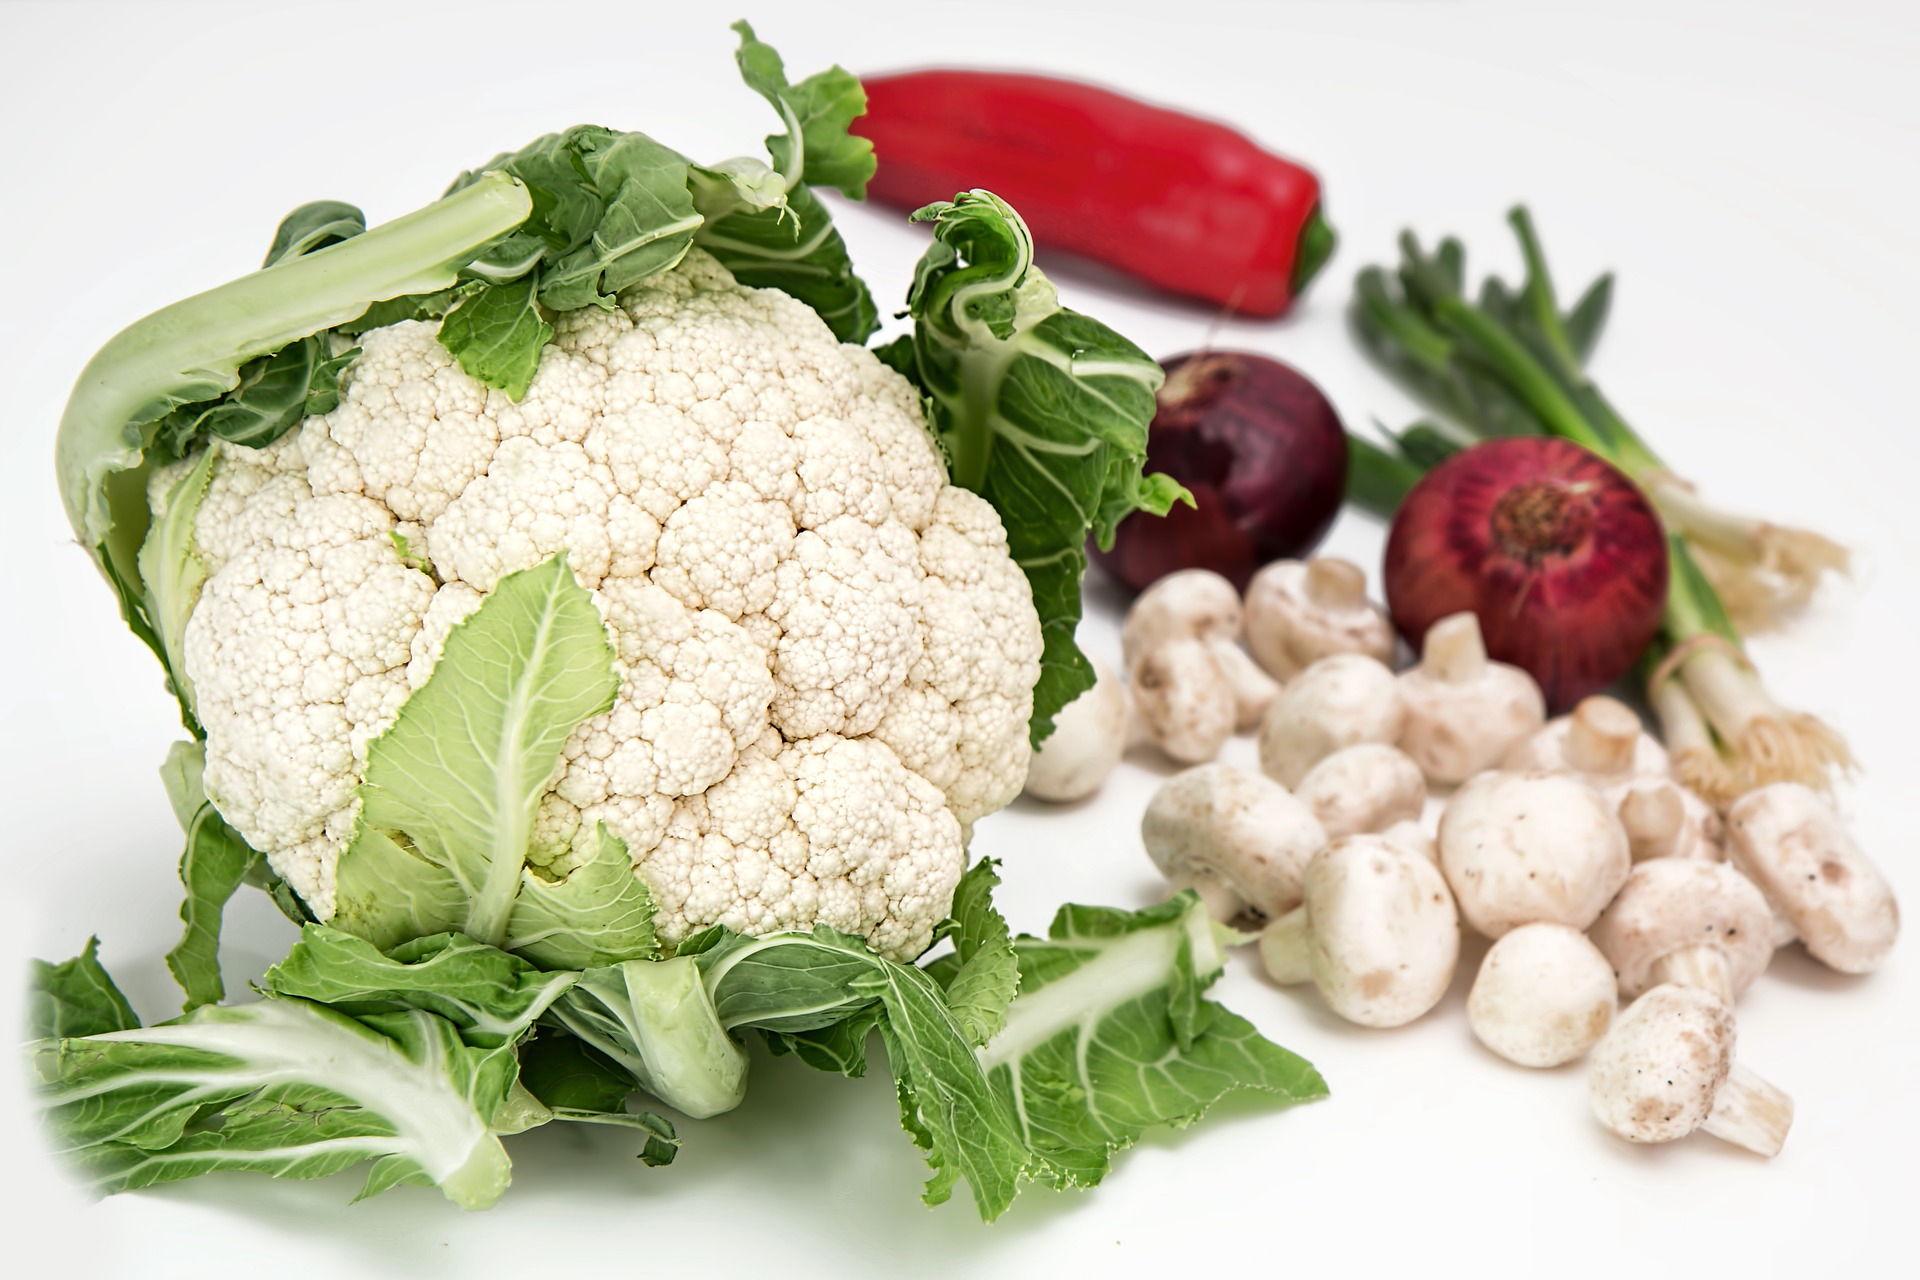 Cauliflower and vegetables